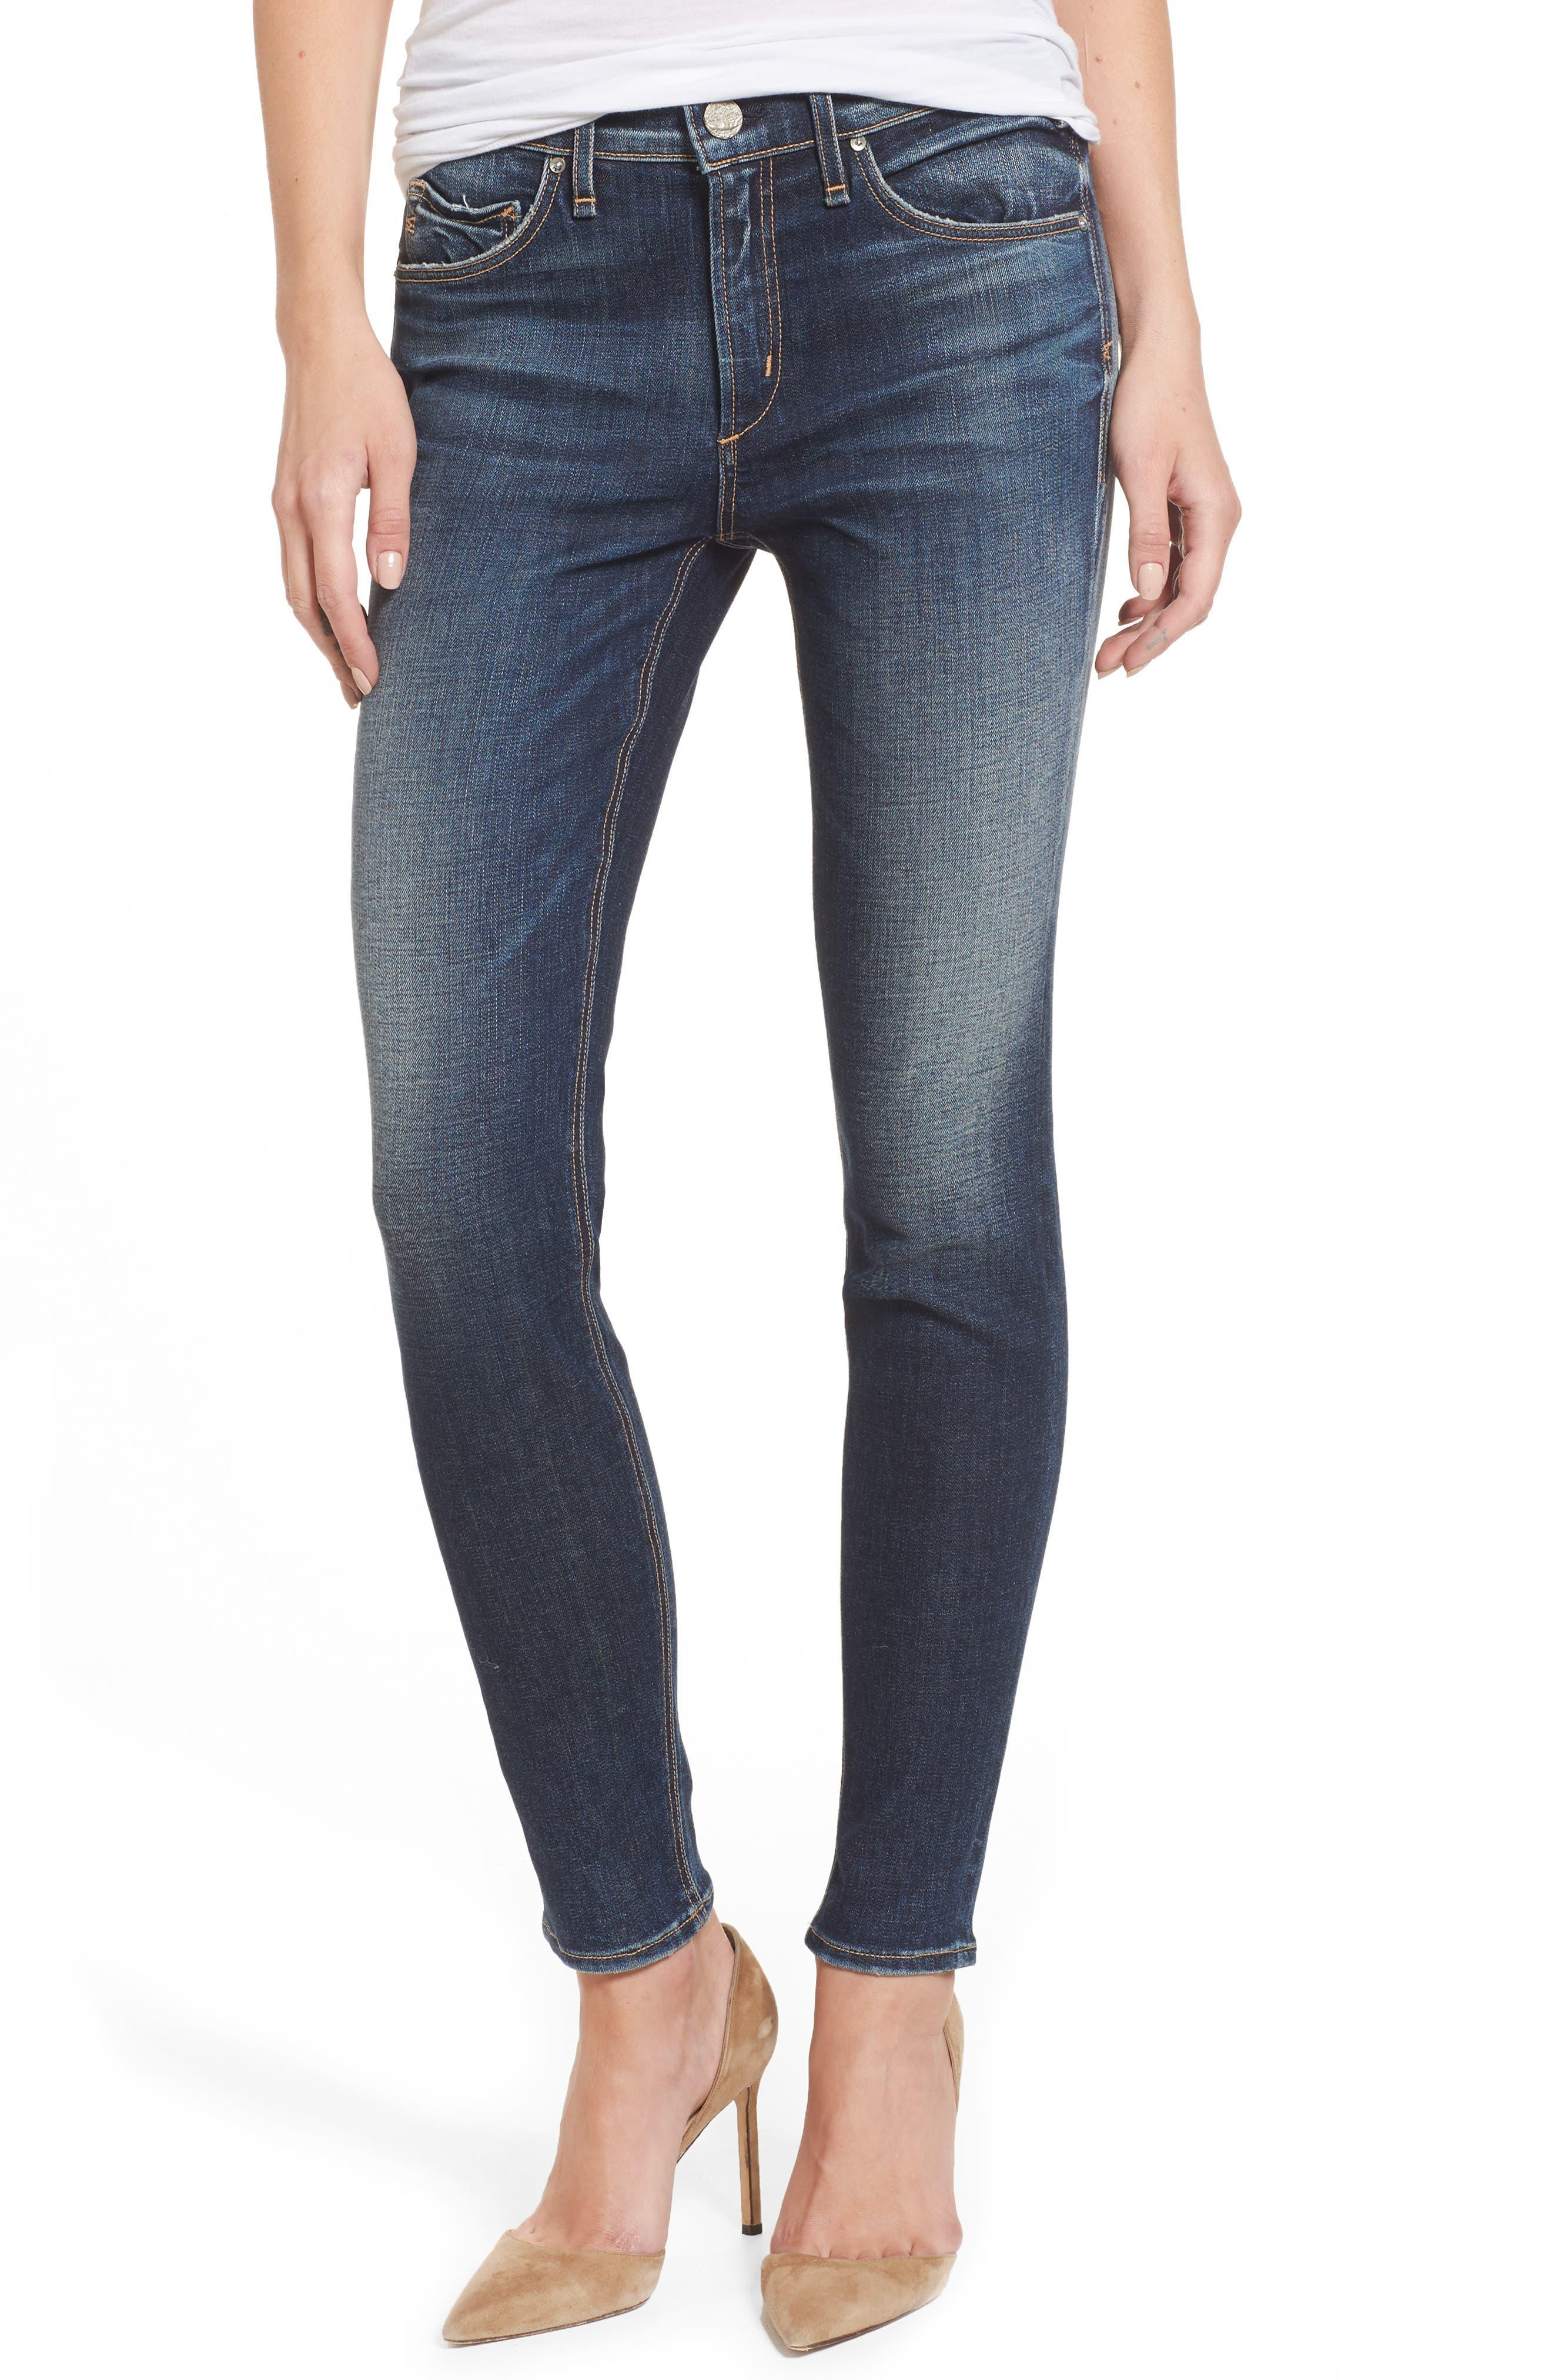 Newton High Waist Skinny Jeans,                             Main thumbnail 1, color,                             420